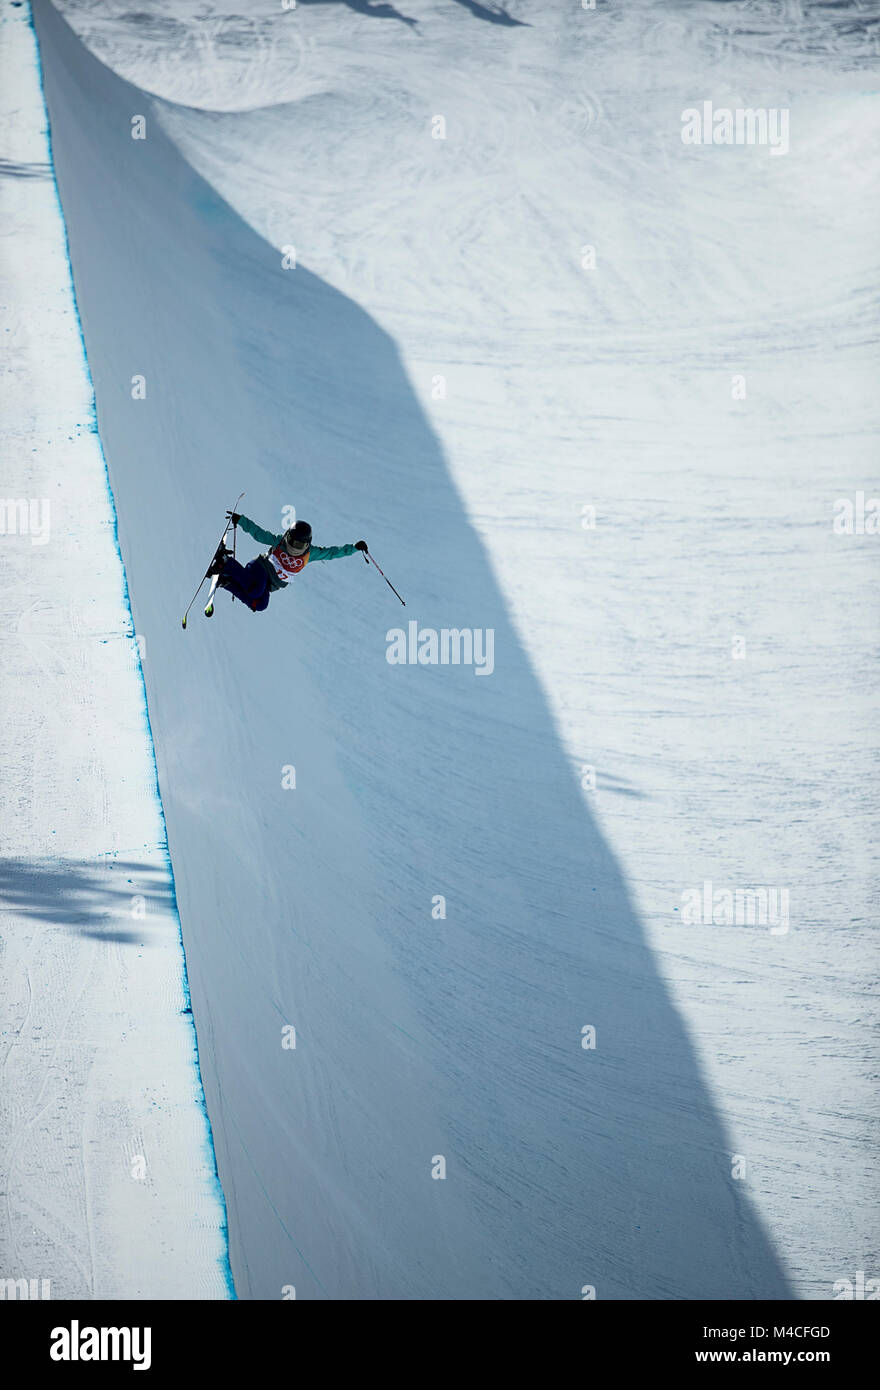 Pyeongchang, South Korea  16th Feb, 2018  Freestyle skiers